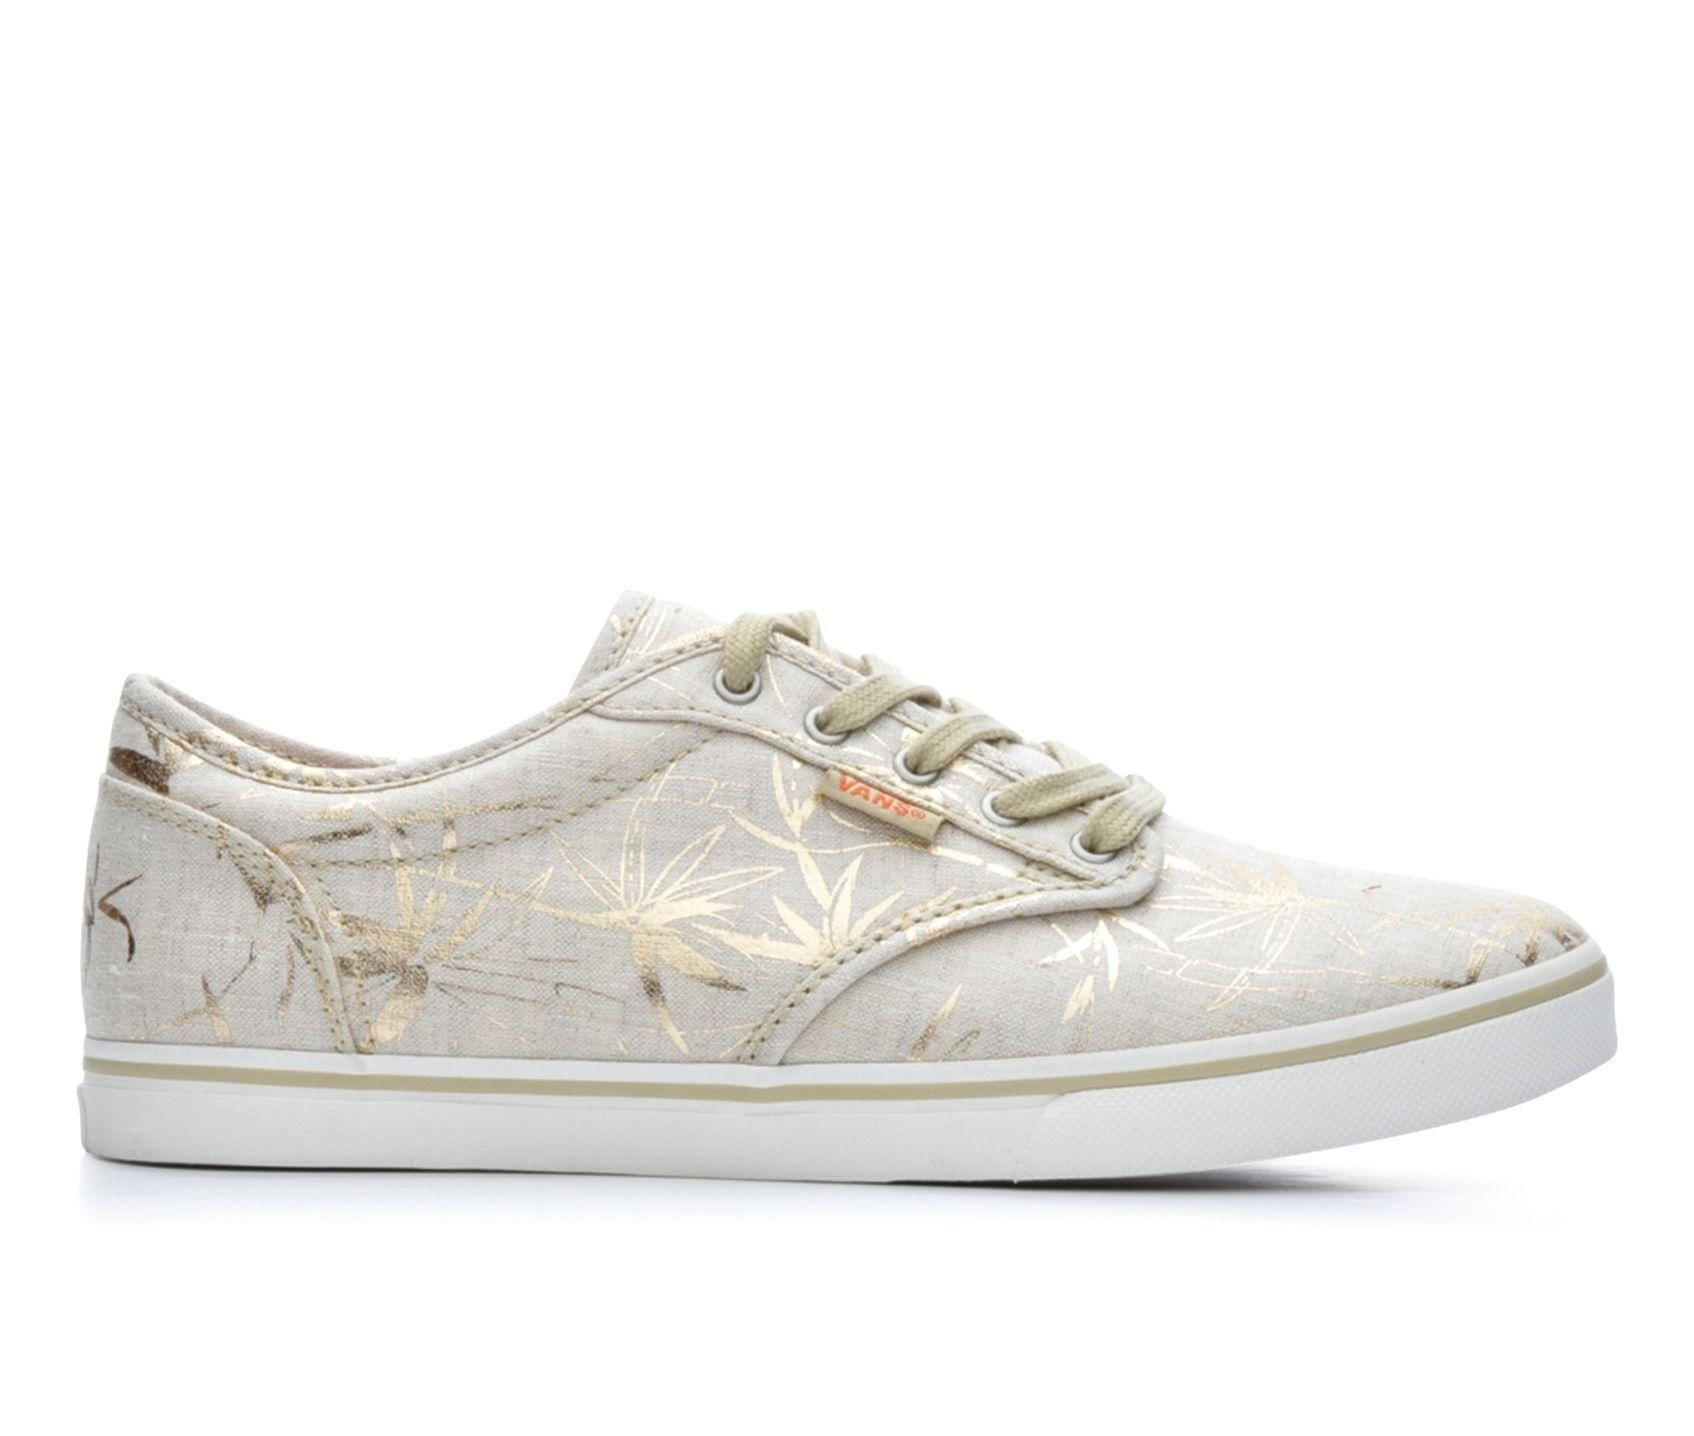 1aafce807f Women s Vans Atwood Low Textile Skate Shoes Women s Vans